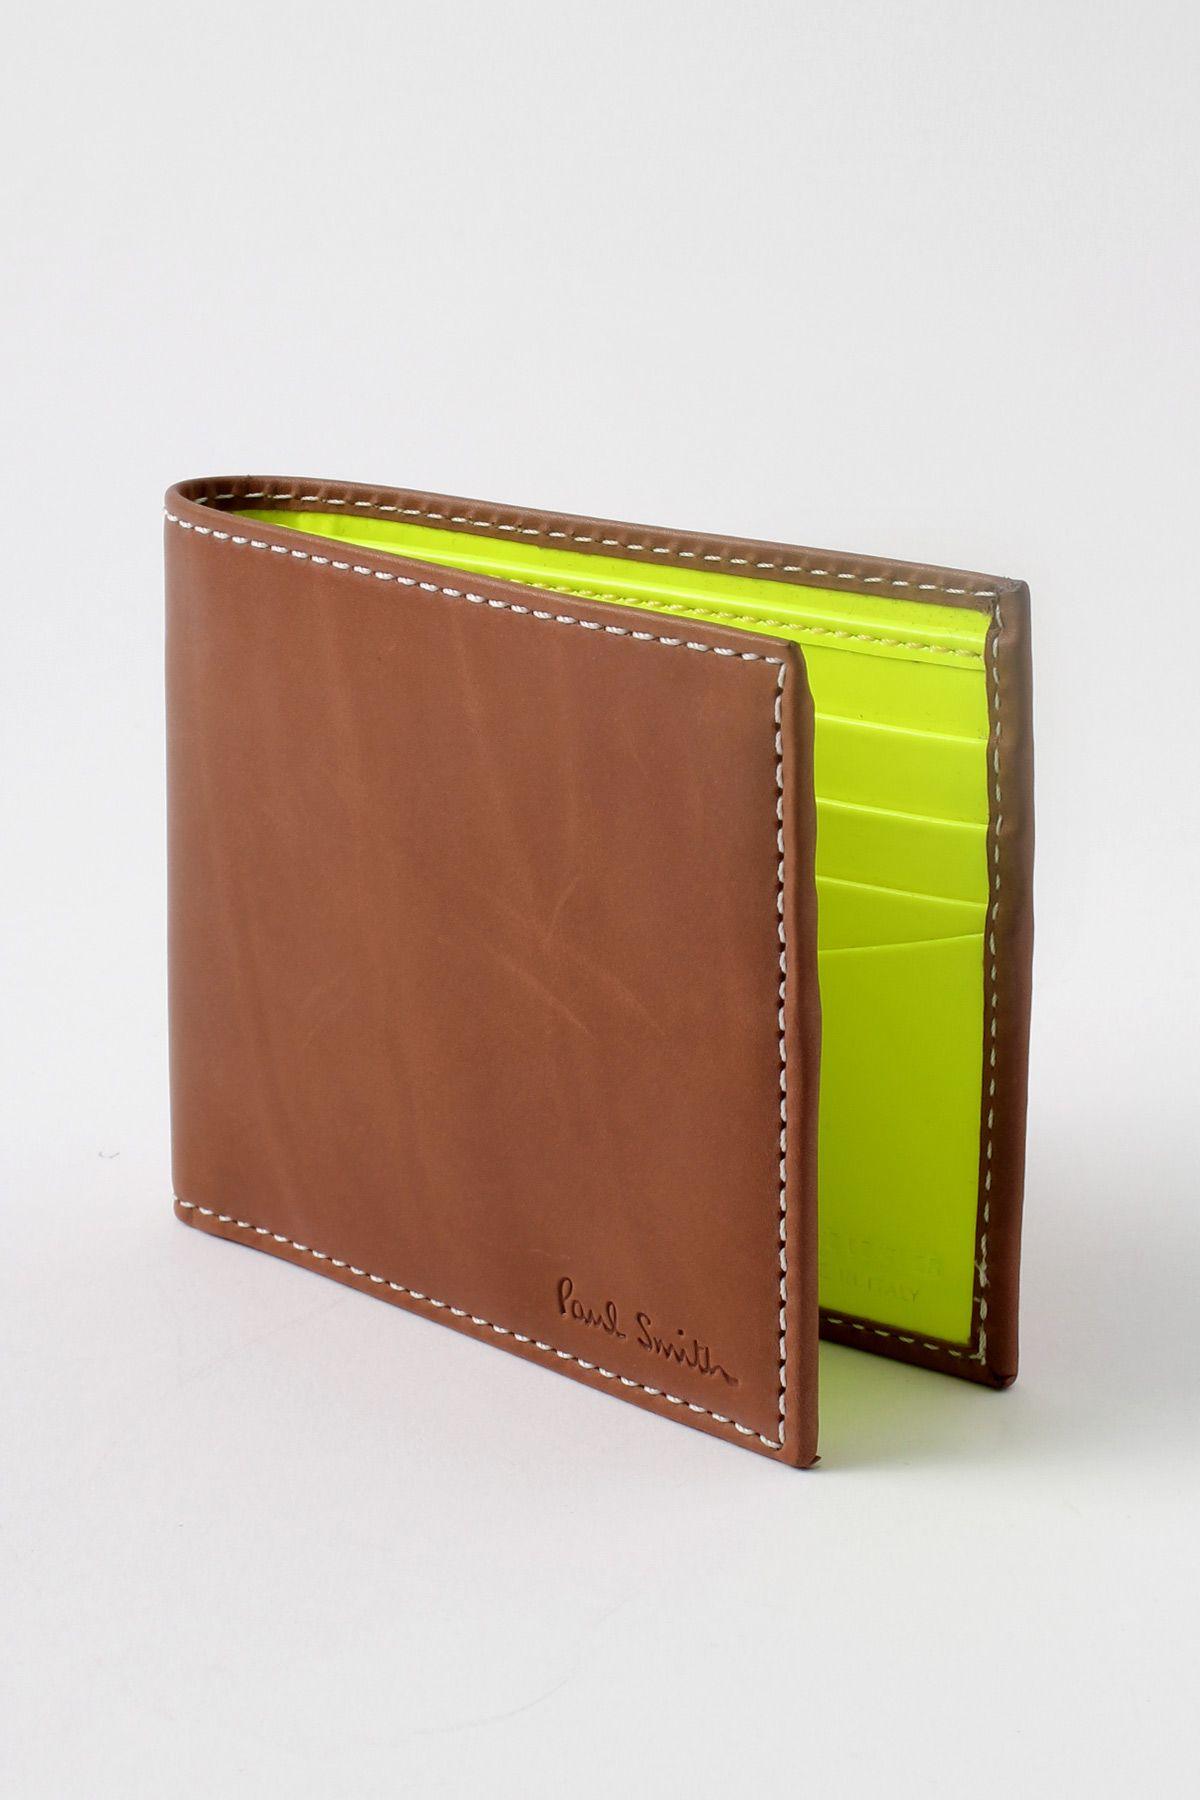 calificación zona encerrar  Paul Smith - ~$250   Leather wallet mens, Leather accessories, Leather  wallet